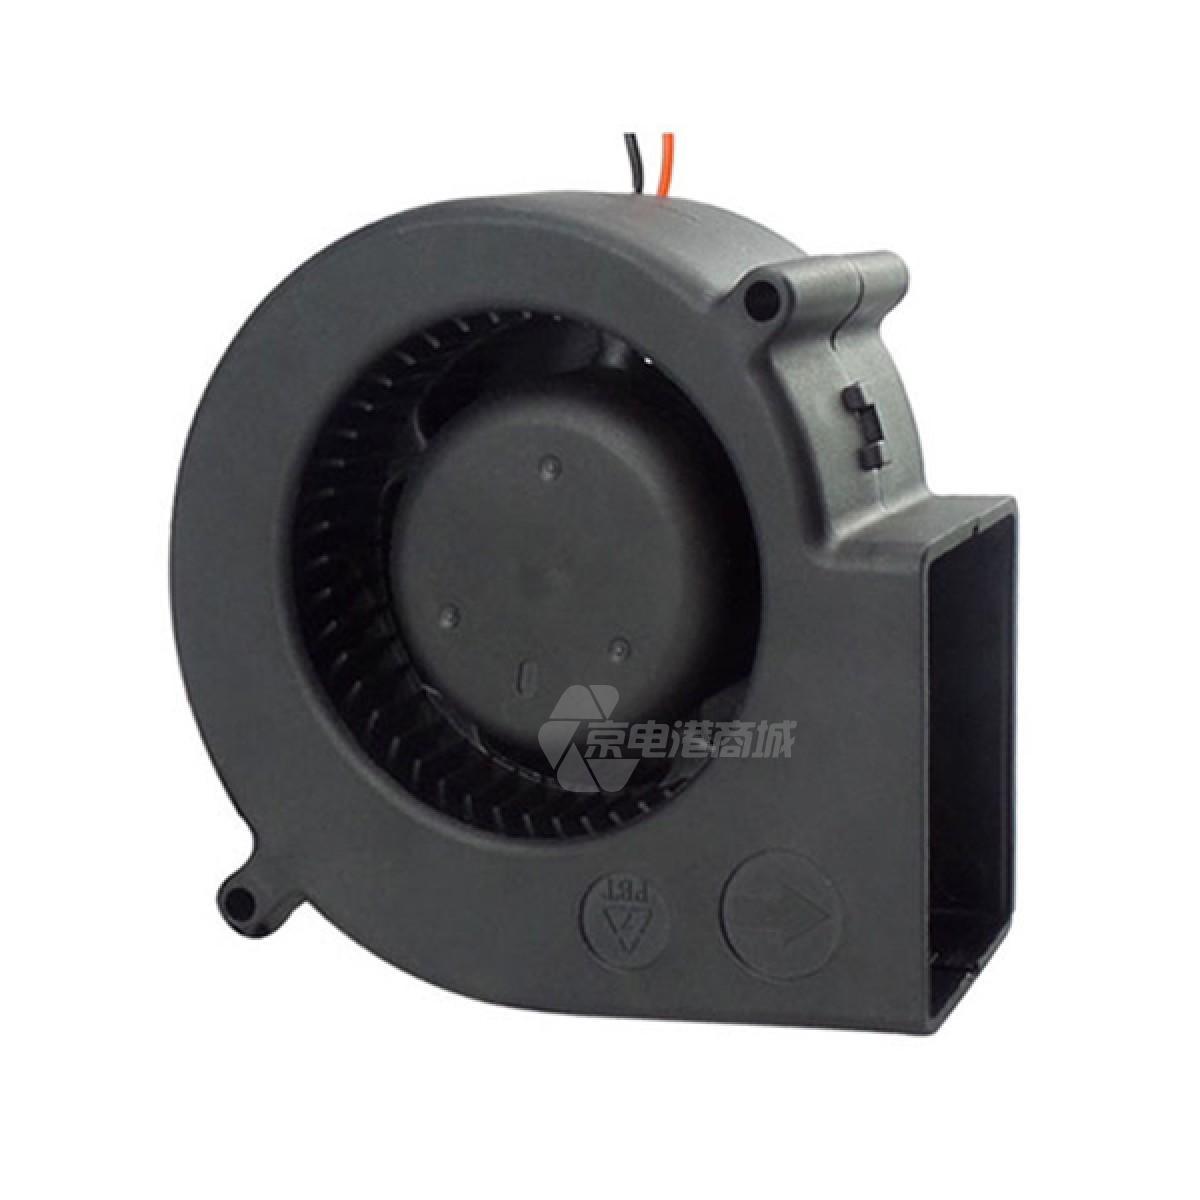 EVERCOOL EC7530HH12X-B 12VDC 0.3A DC BLOWER FAN